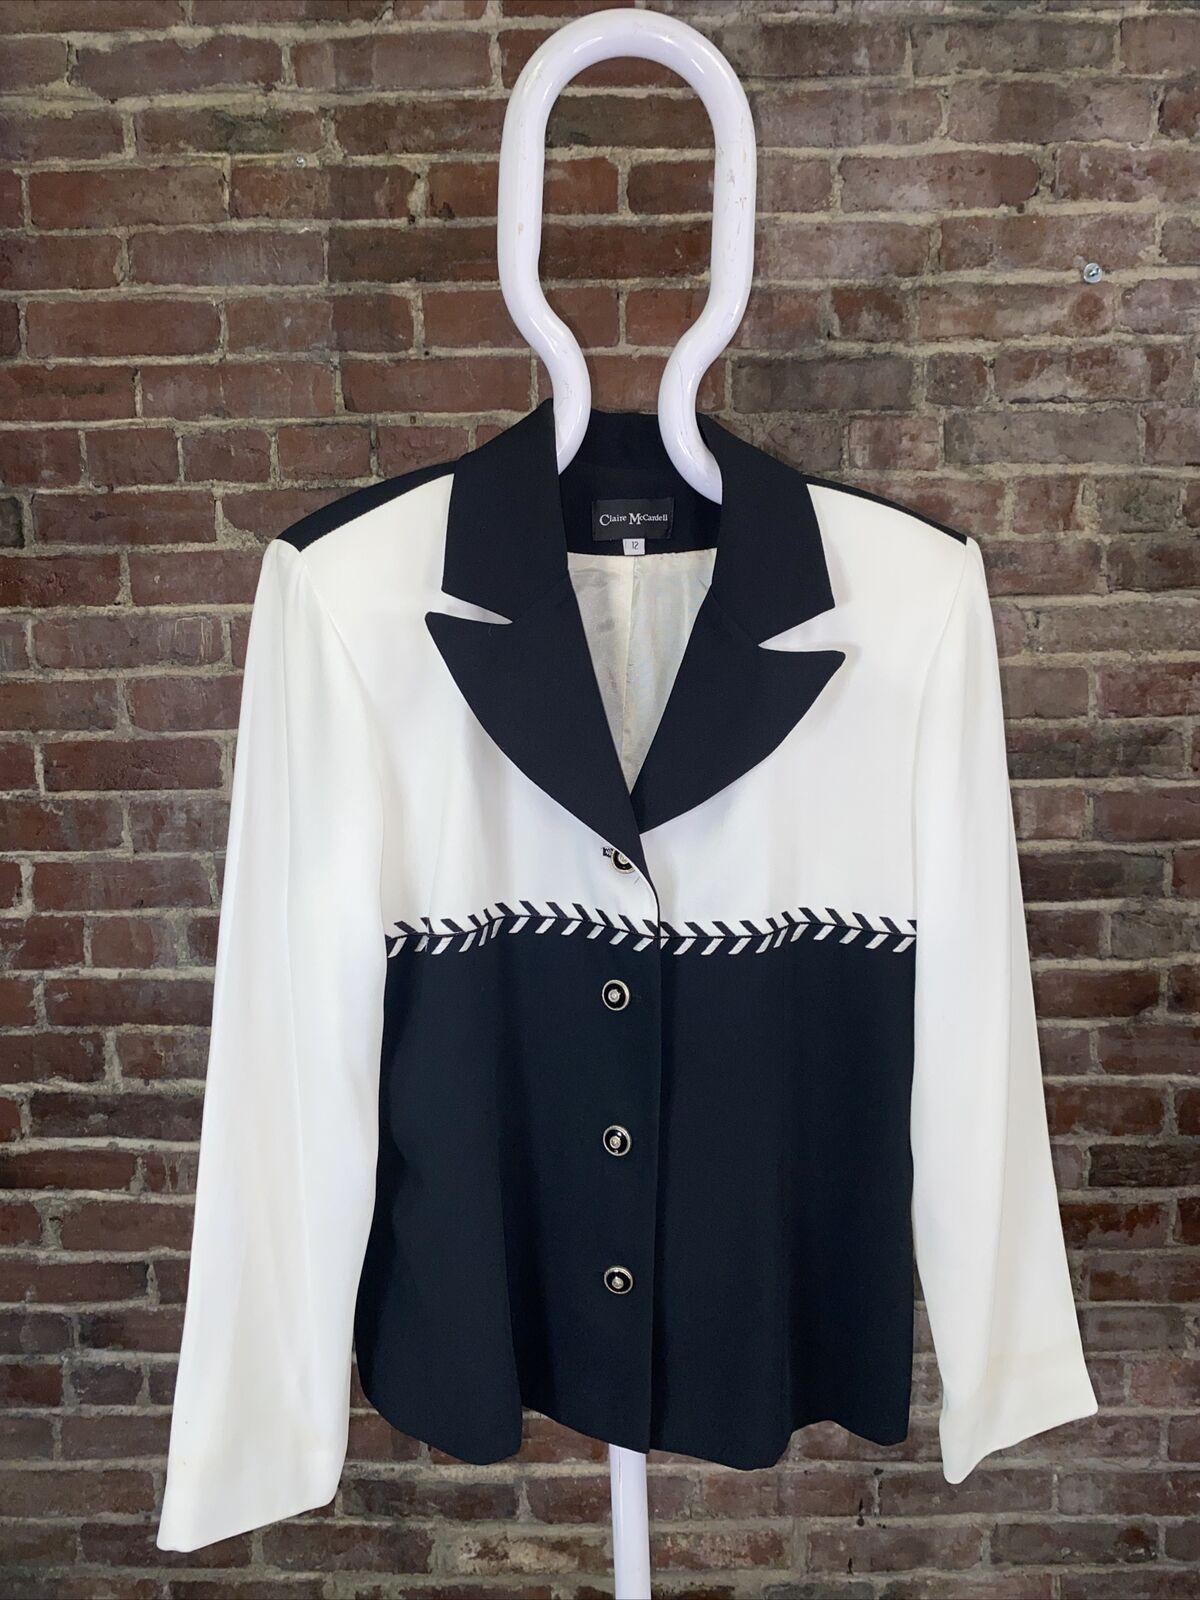 Claire McCardell vintage jacket circa 1950s Rocka… - image 2